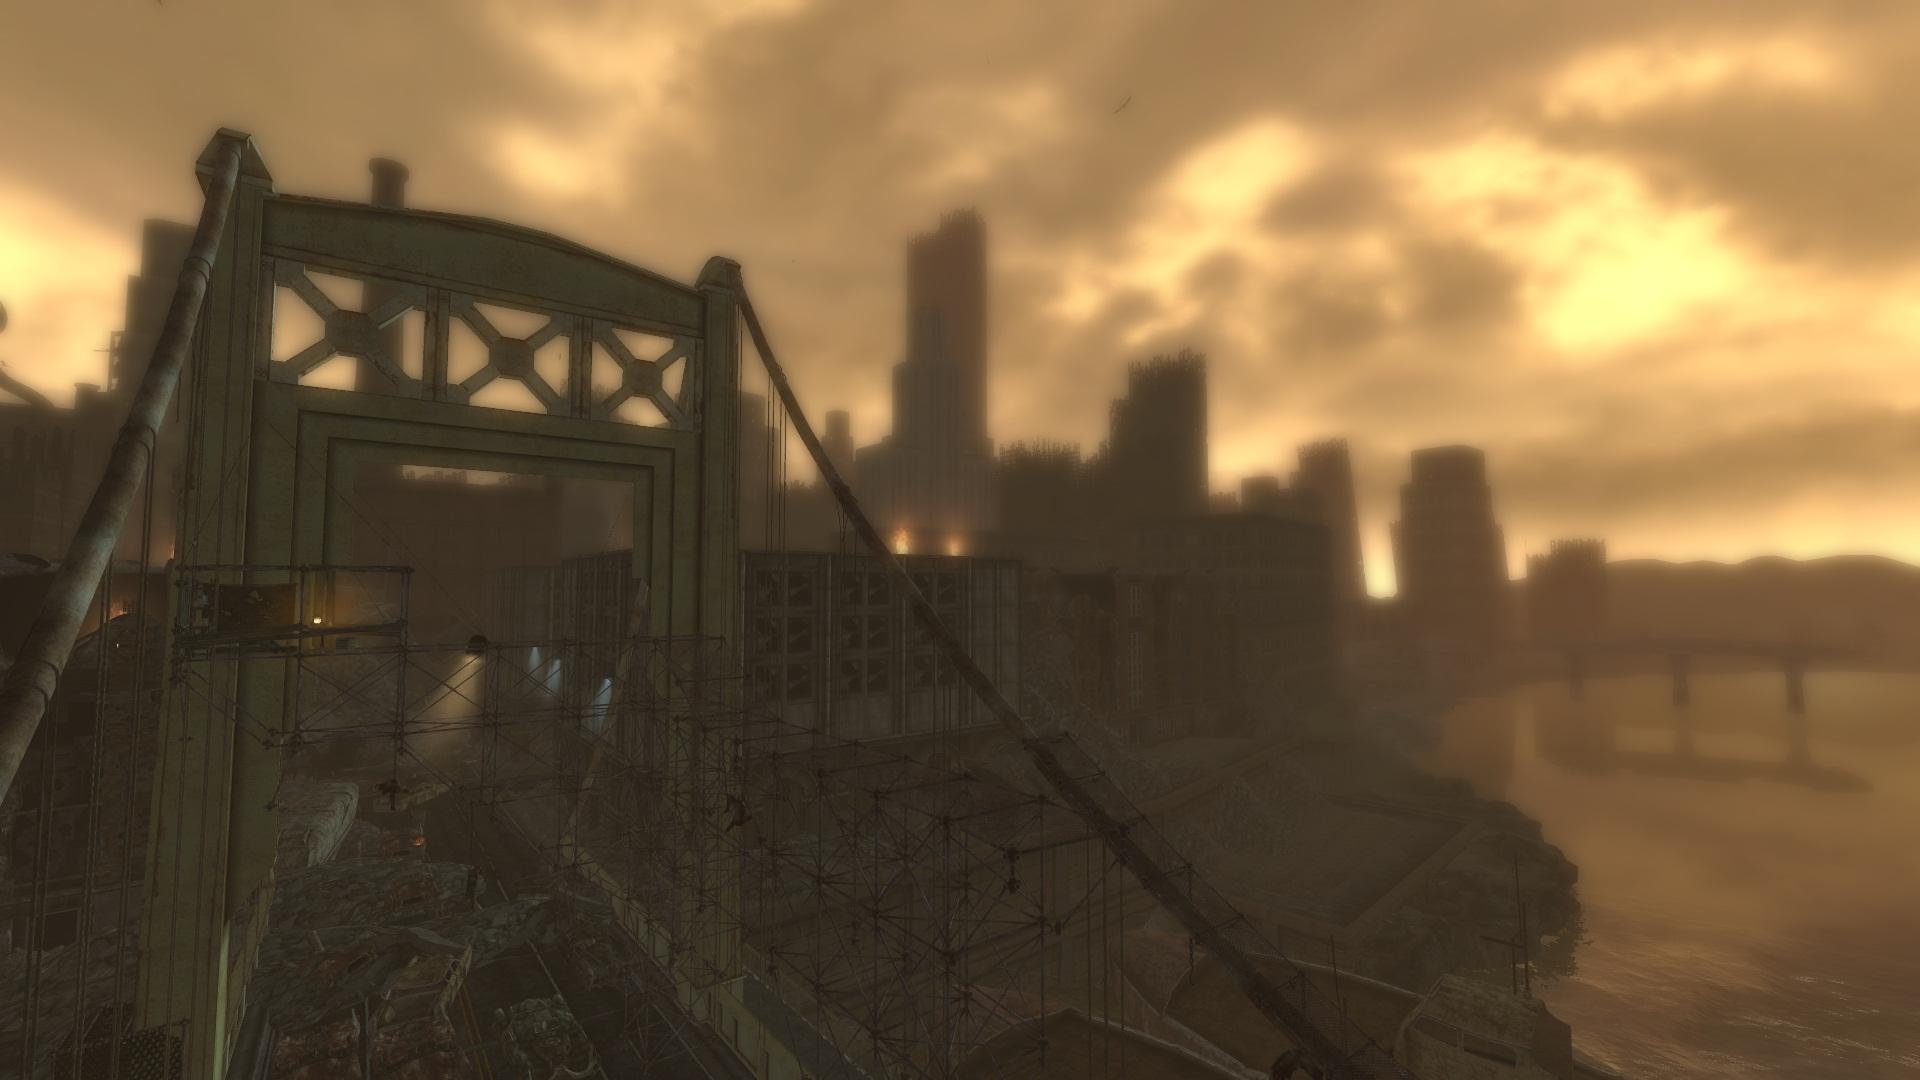 The Pitt from the Bridge